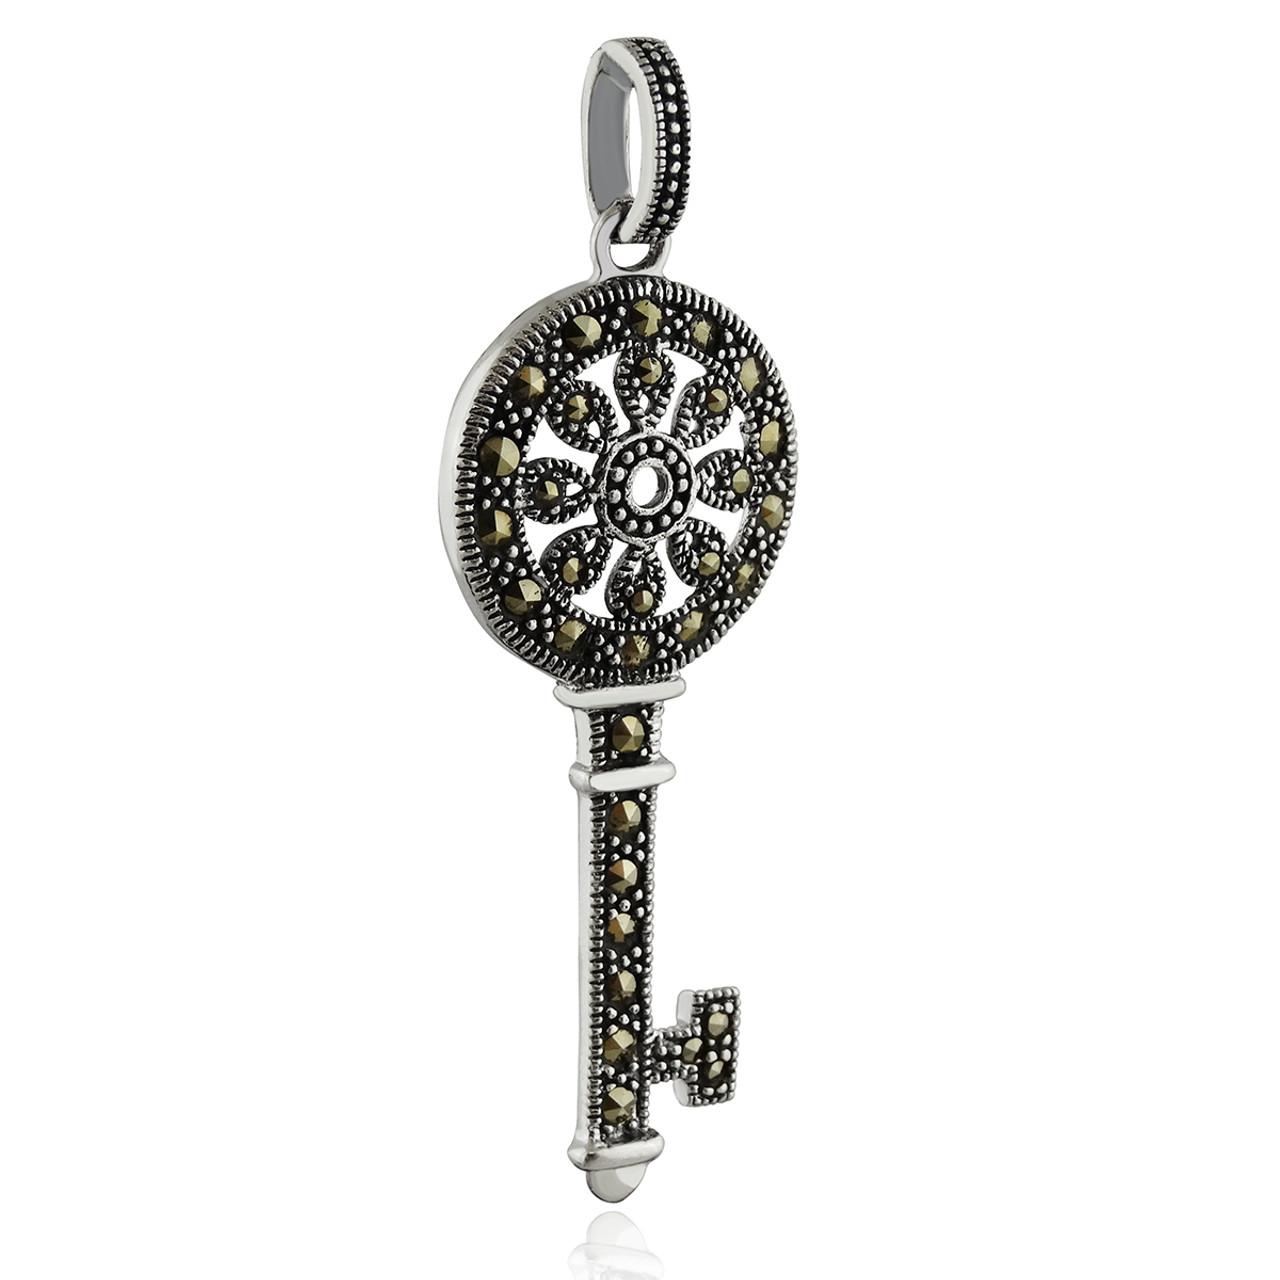 Sterling silver marcasite skeleton key pendant reo company sterling silver marcasite skeleton key pendant aloadofball Images